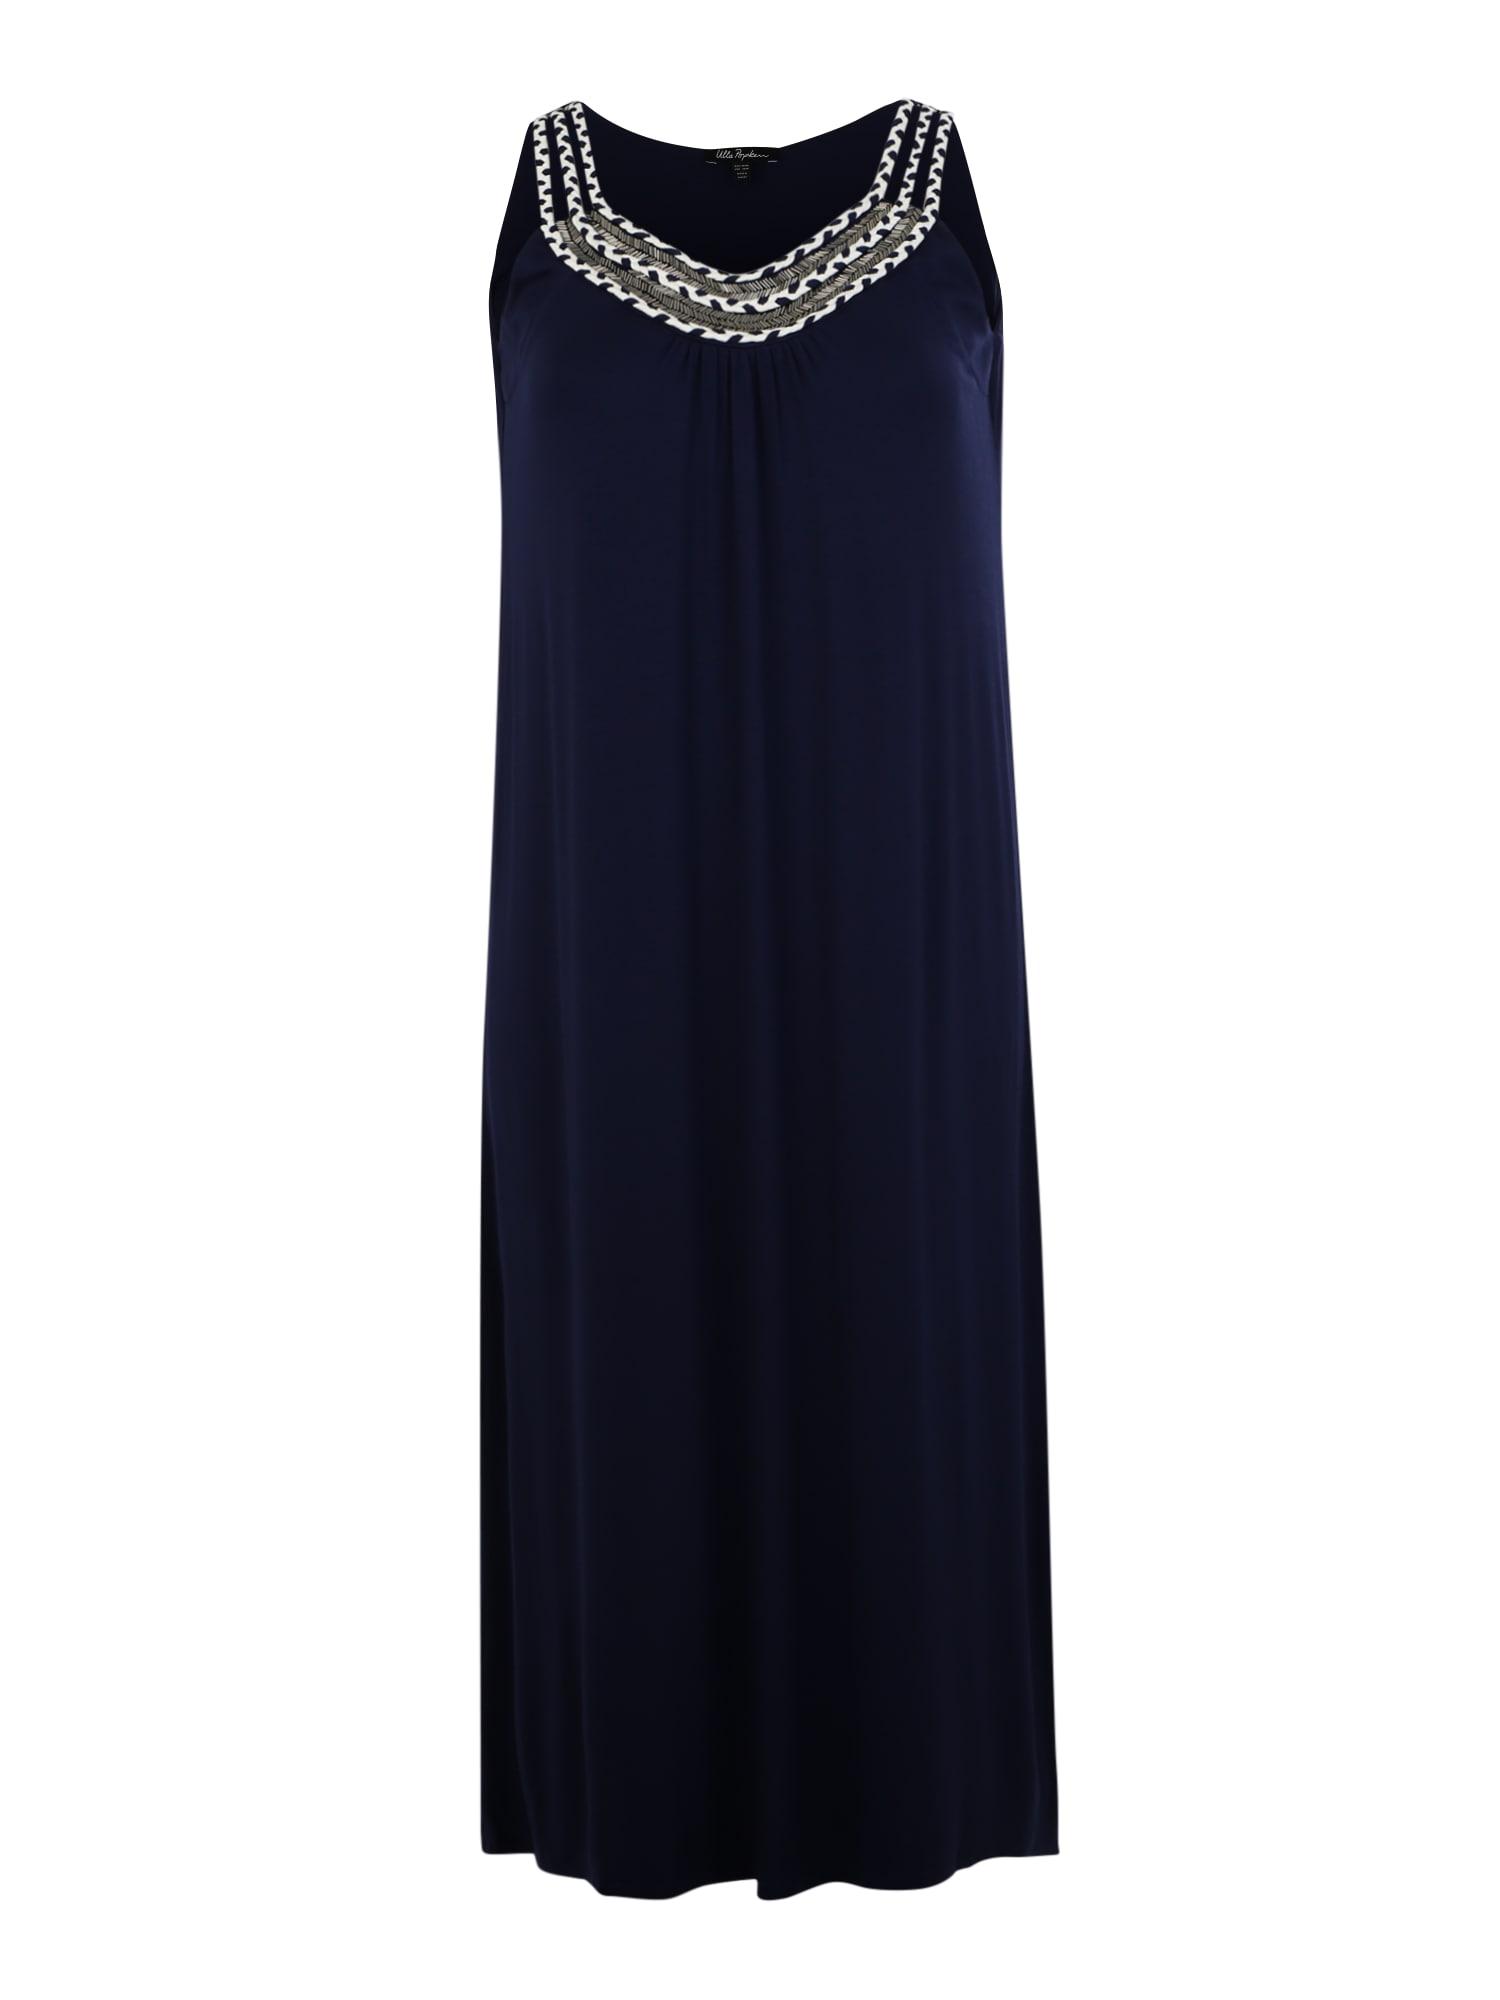 Letní šaty Kordel tmavě modrá bílá Ulla Popken